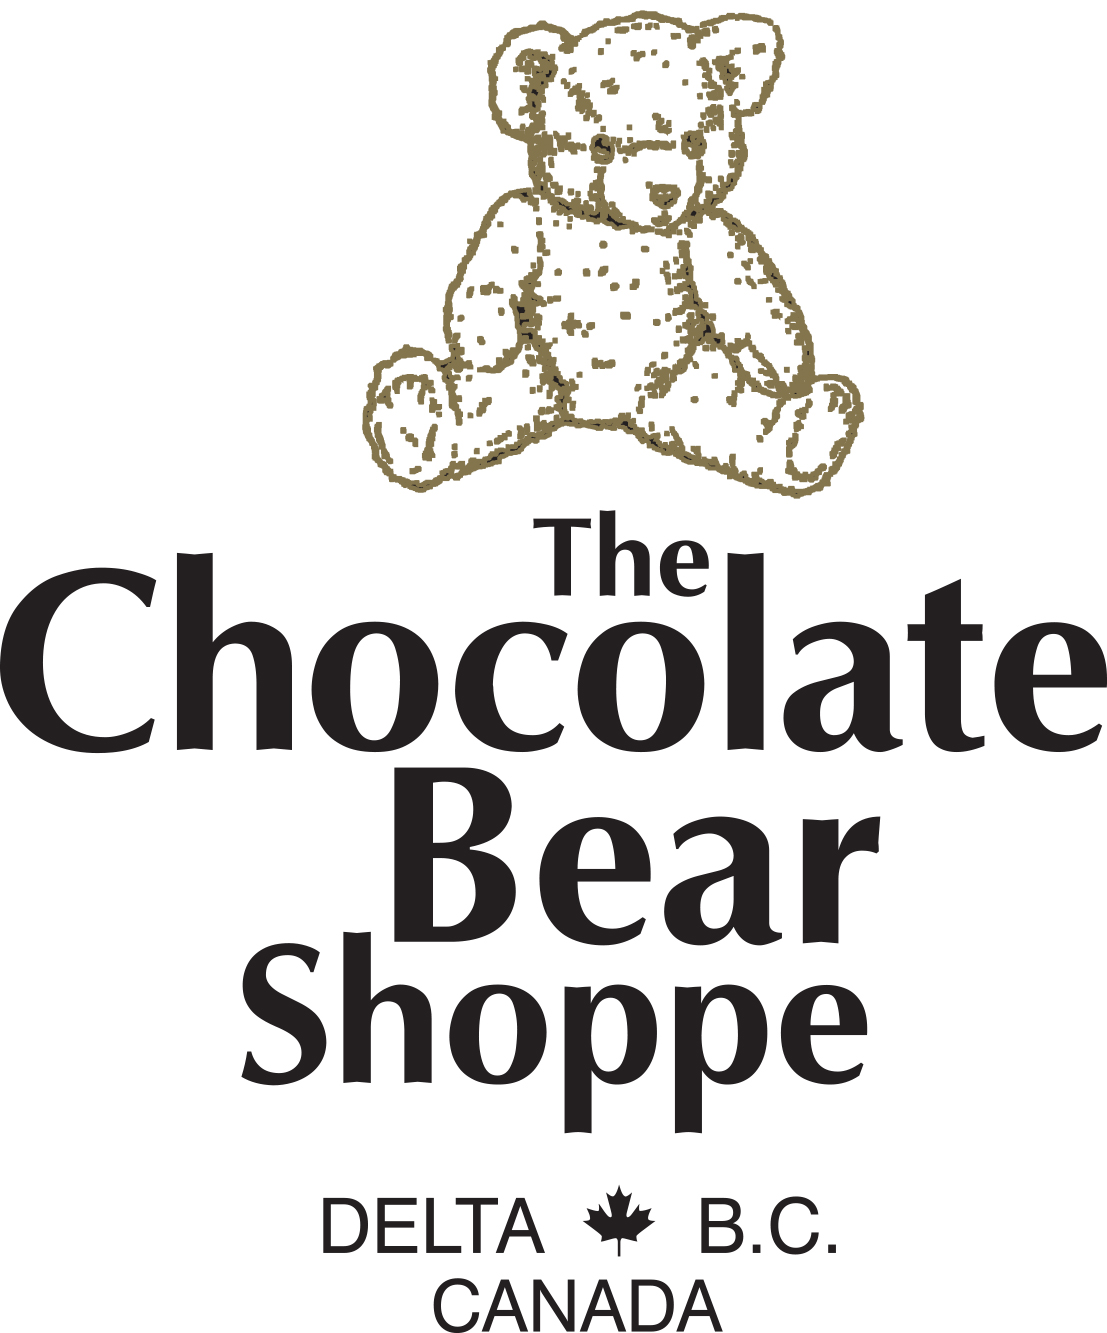 Chocolate Bear Shoppe